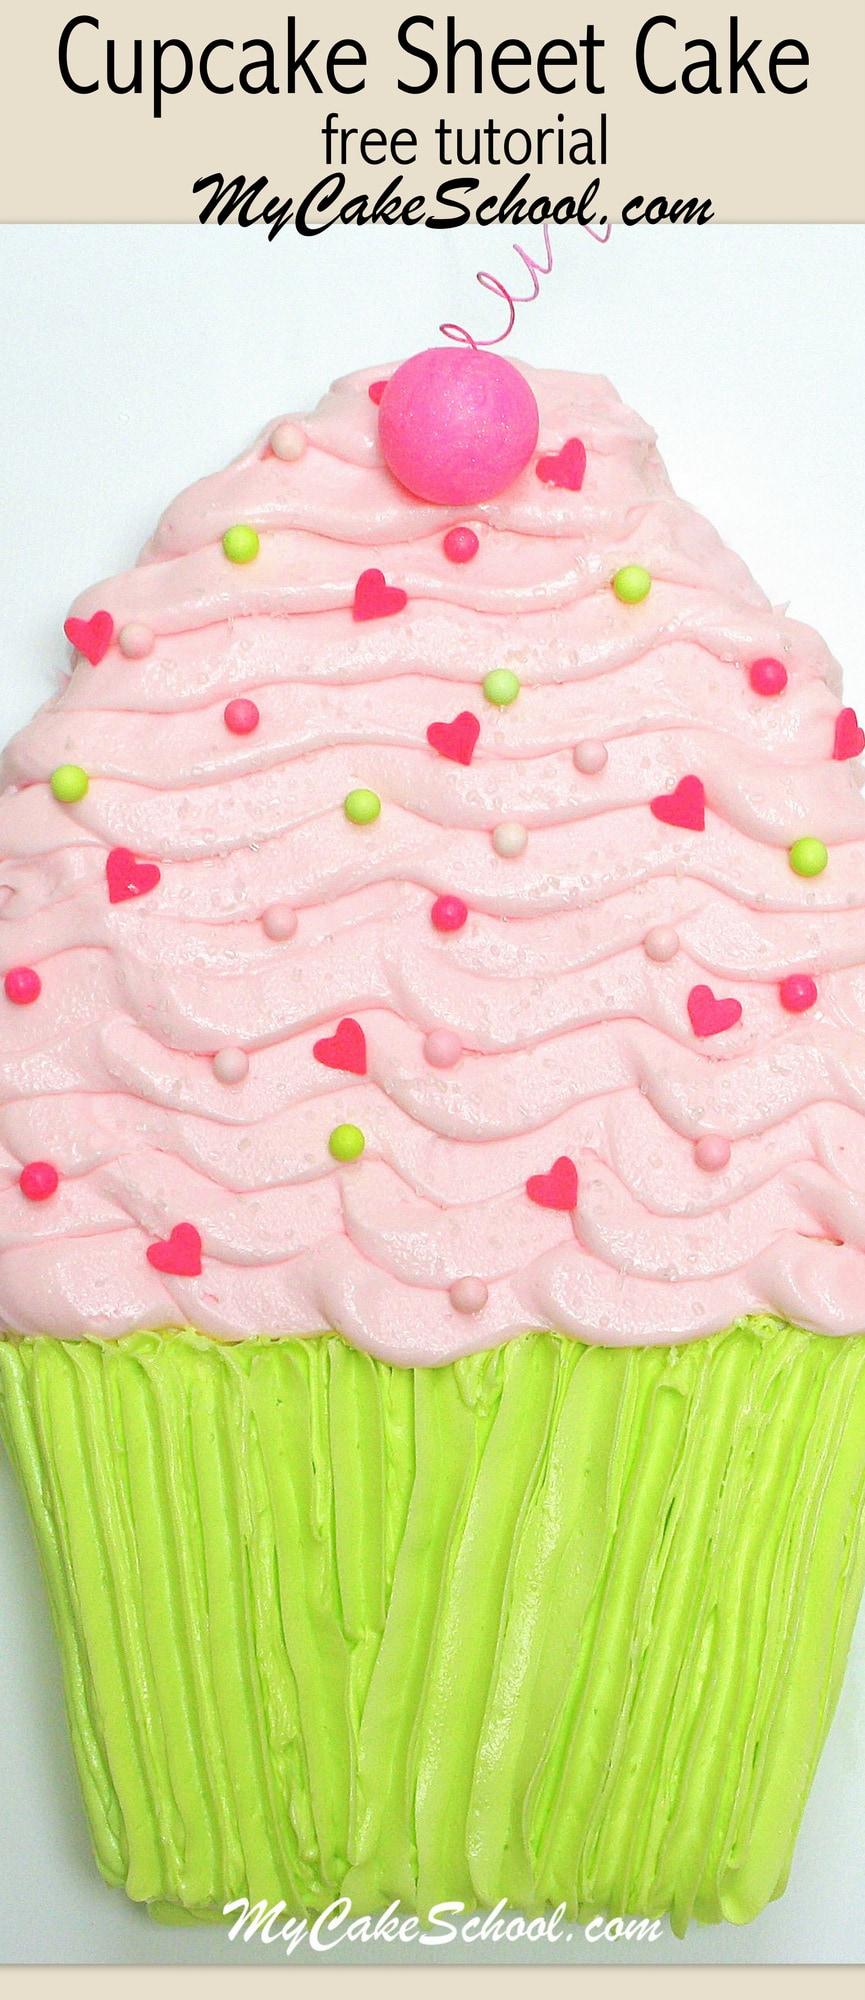 Cupcake Decorating Ideas Blog : Cupcake Sheet Cake Tutorial My Cake School